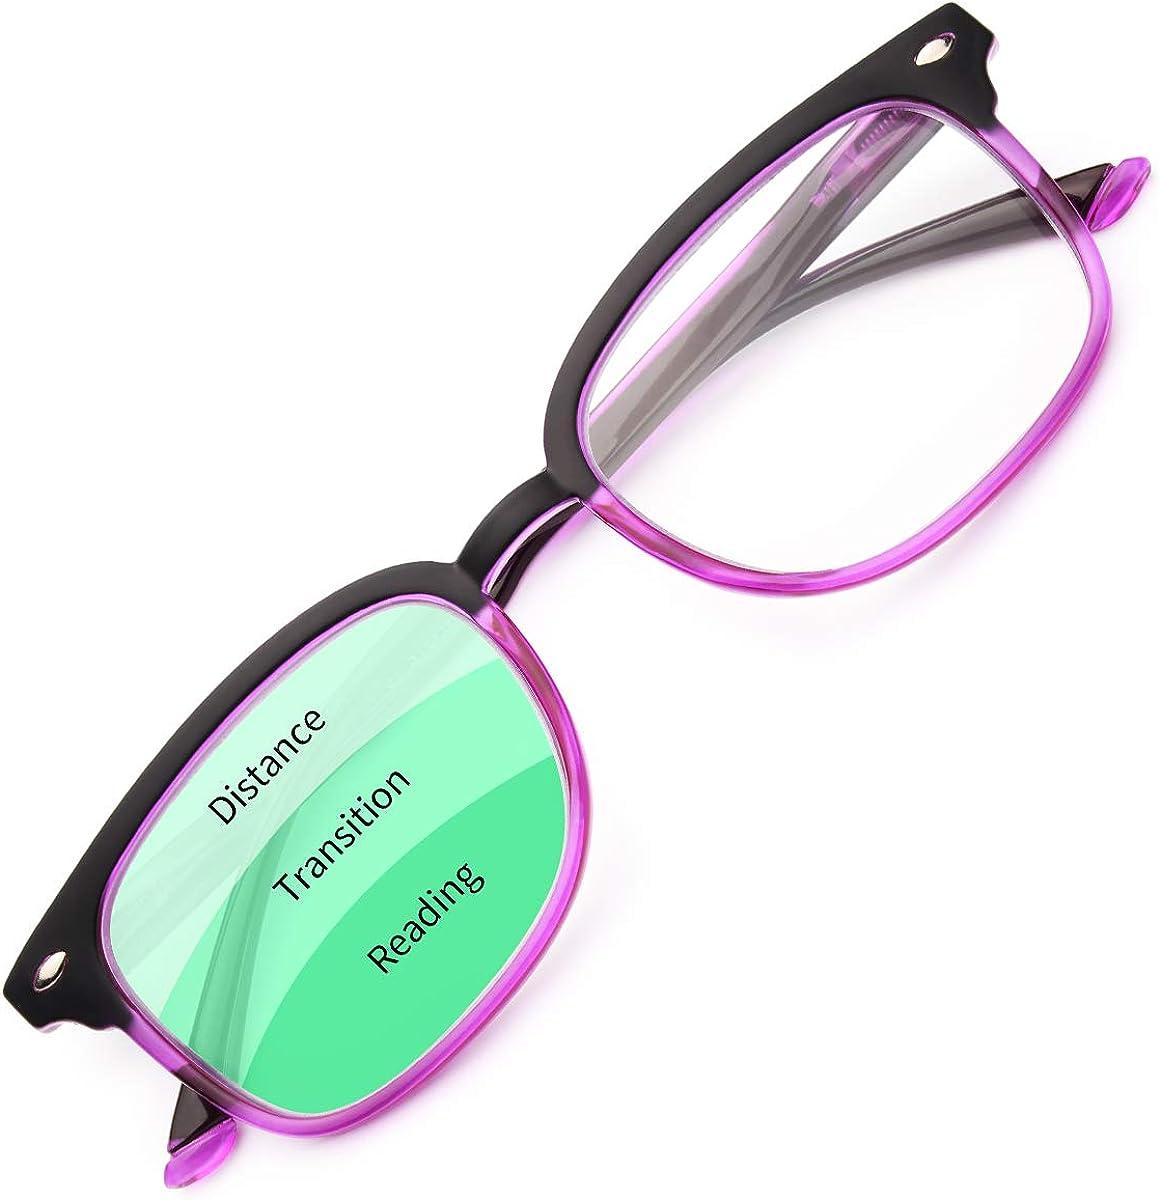 Gaoye Progressive Multifocus Reading Glasses Blue Light Blocking for Women Men,No Line Multifocal Readers with Spring Hinge